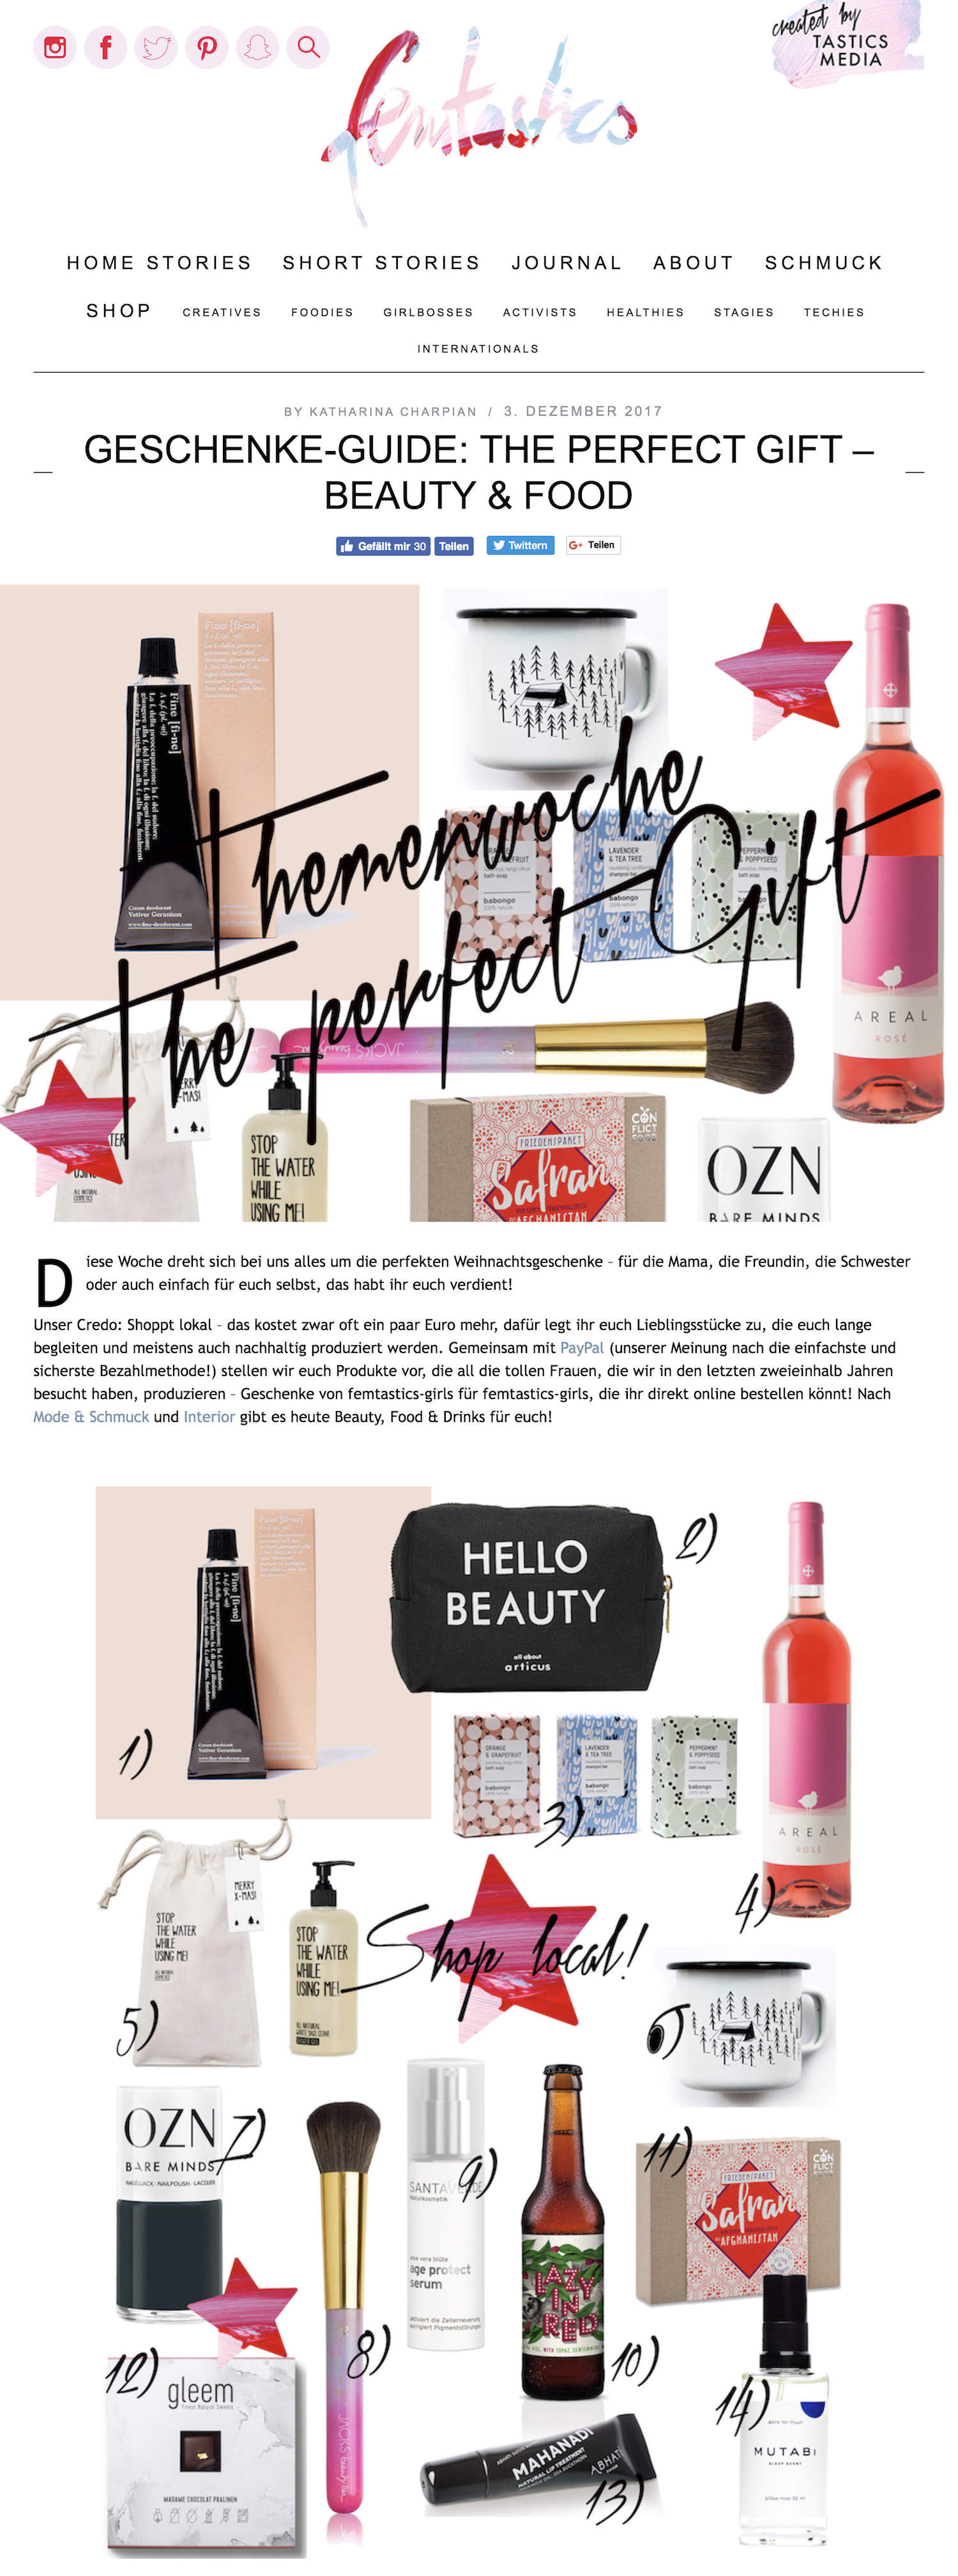 Beautyblog Beautyblogger BARE MINDS Elina Neumann_femtastics.com_03.12.2017